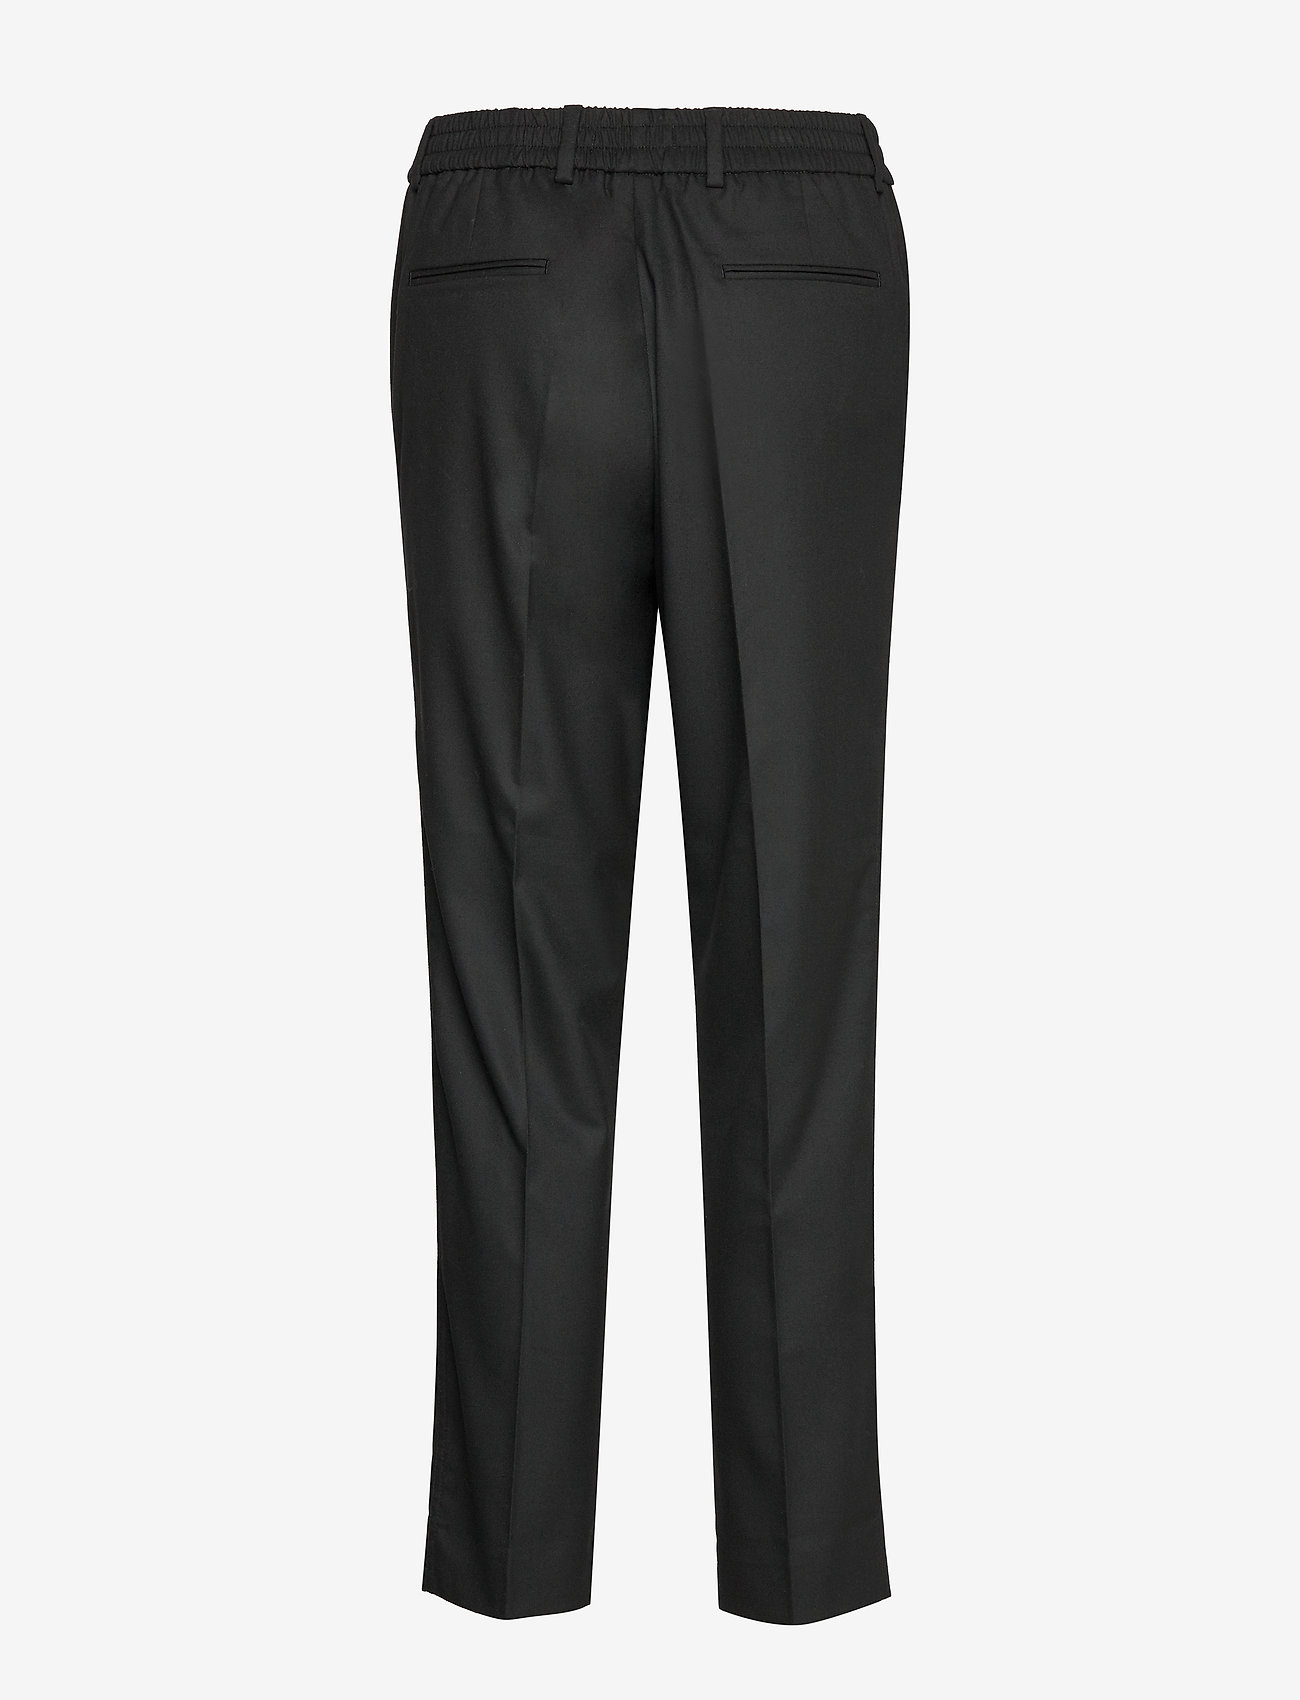 Flannel Tailored Jogger Pant (Calvin Black) - Calvin Klein Xitbcu